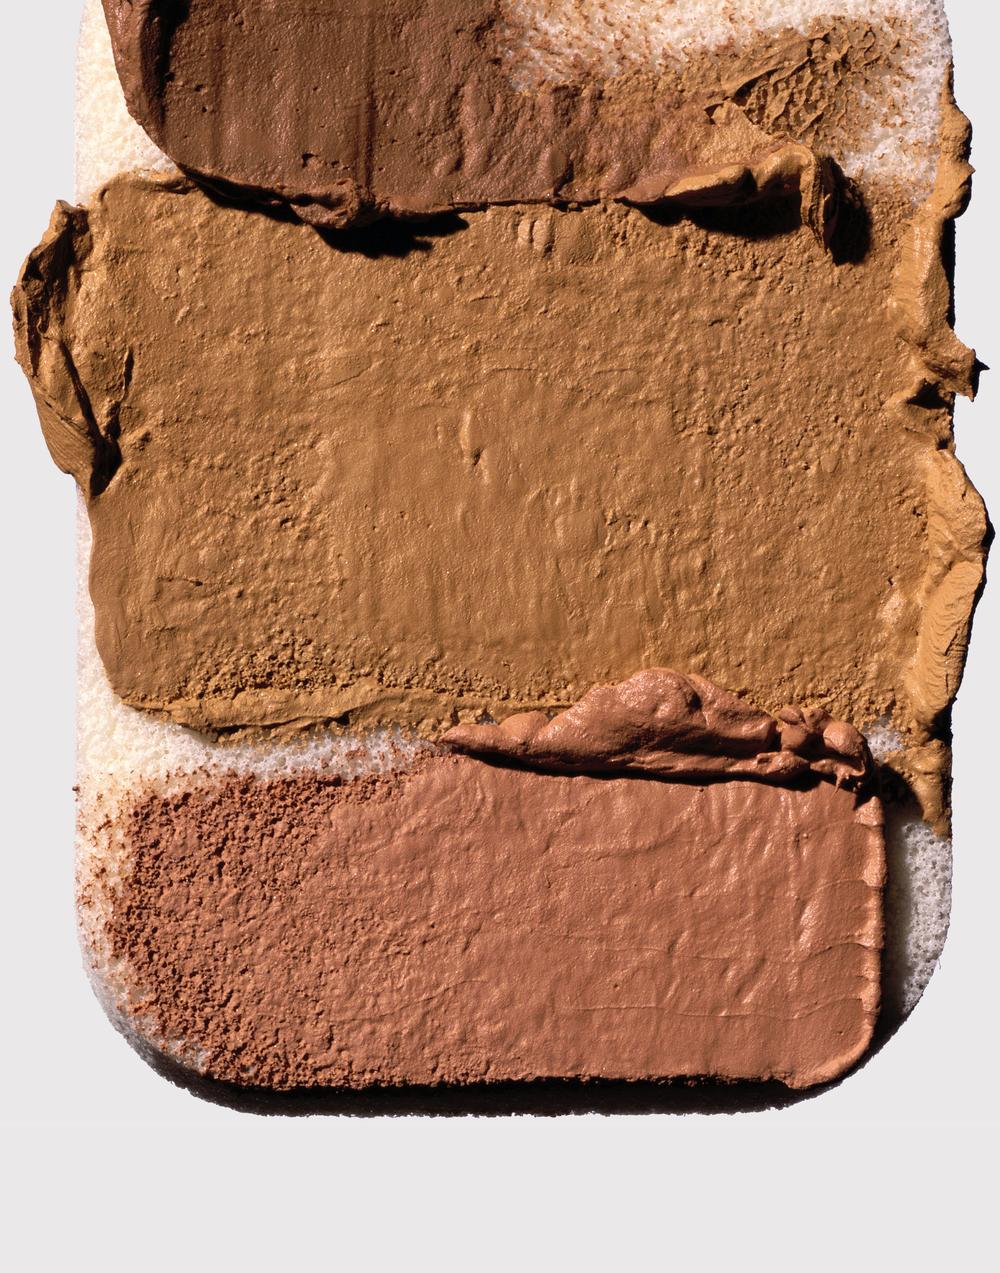 Studio test=Cosmetics=Base=tricolor sponge=11x14.jpg